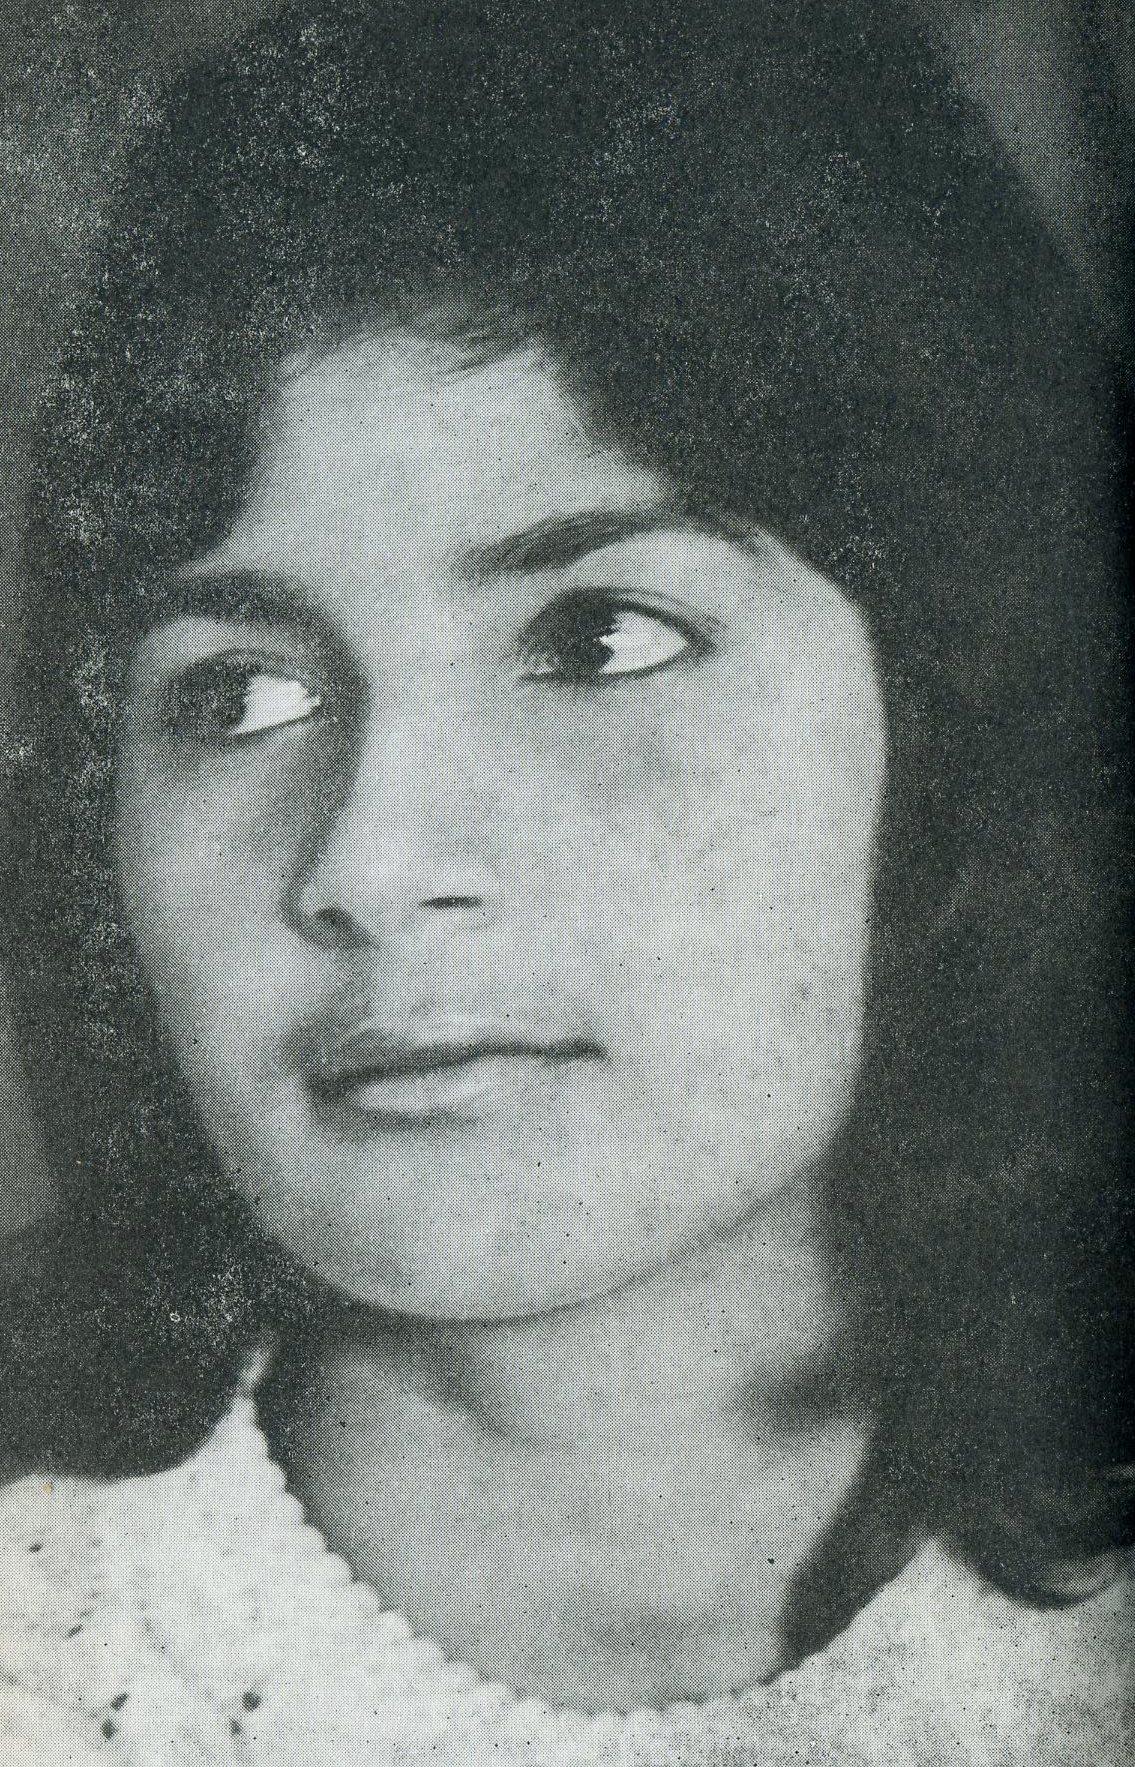 Liliane Nouh Chaia-Issa – Gré Ploeg (boerinnenkostuum, de moeder van Diana Dubois) – Tine Slager (kotomissie) - no5